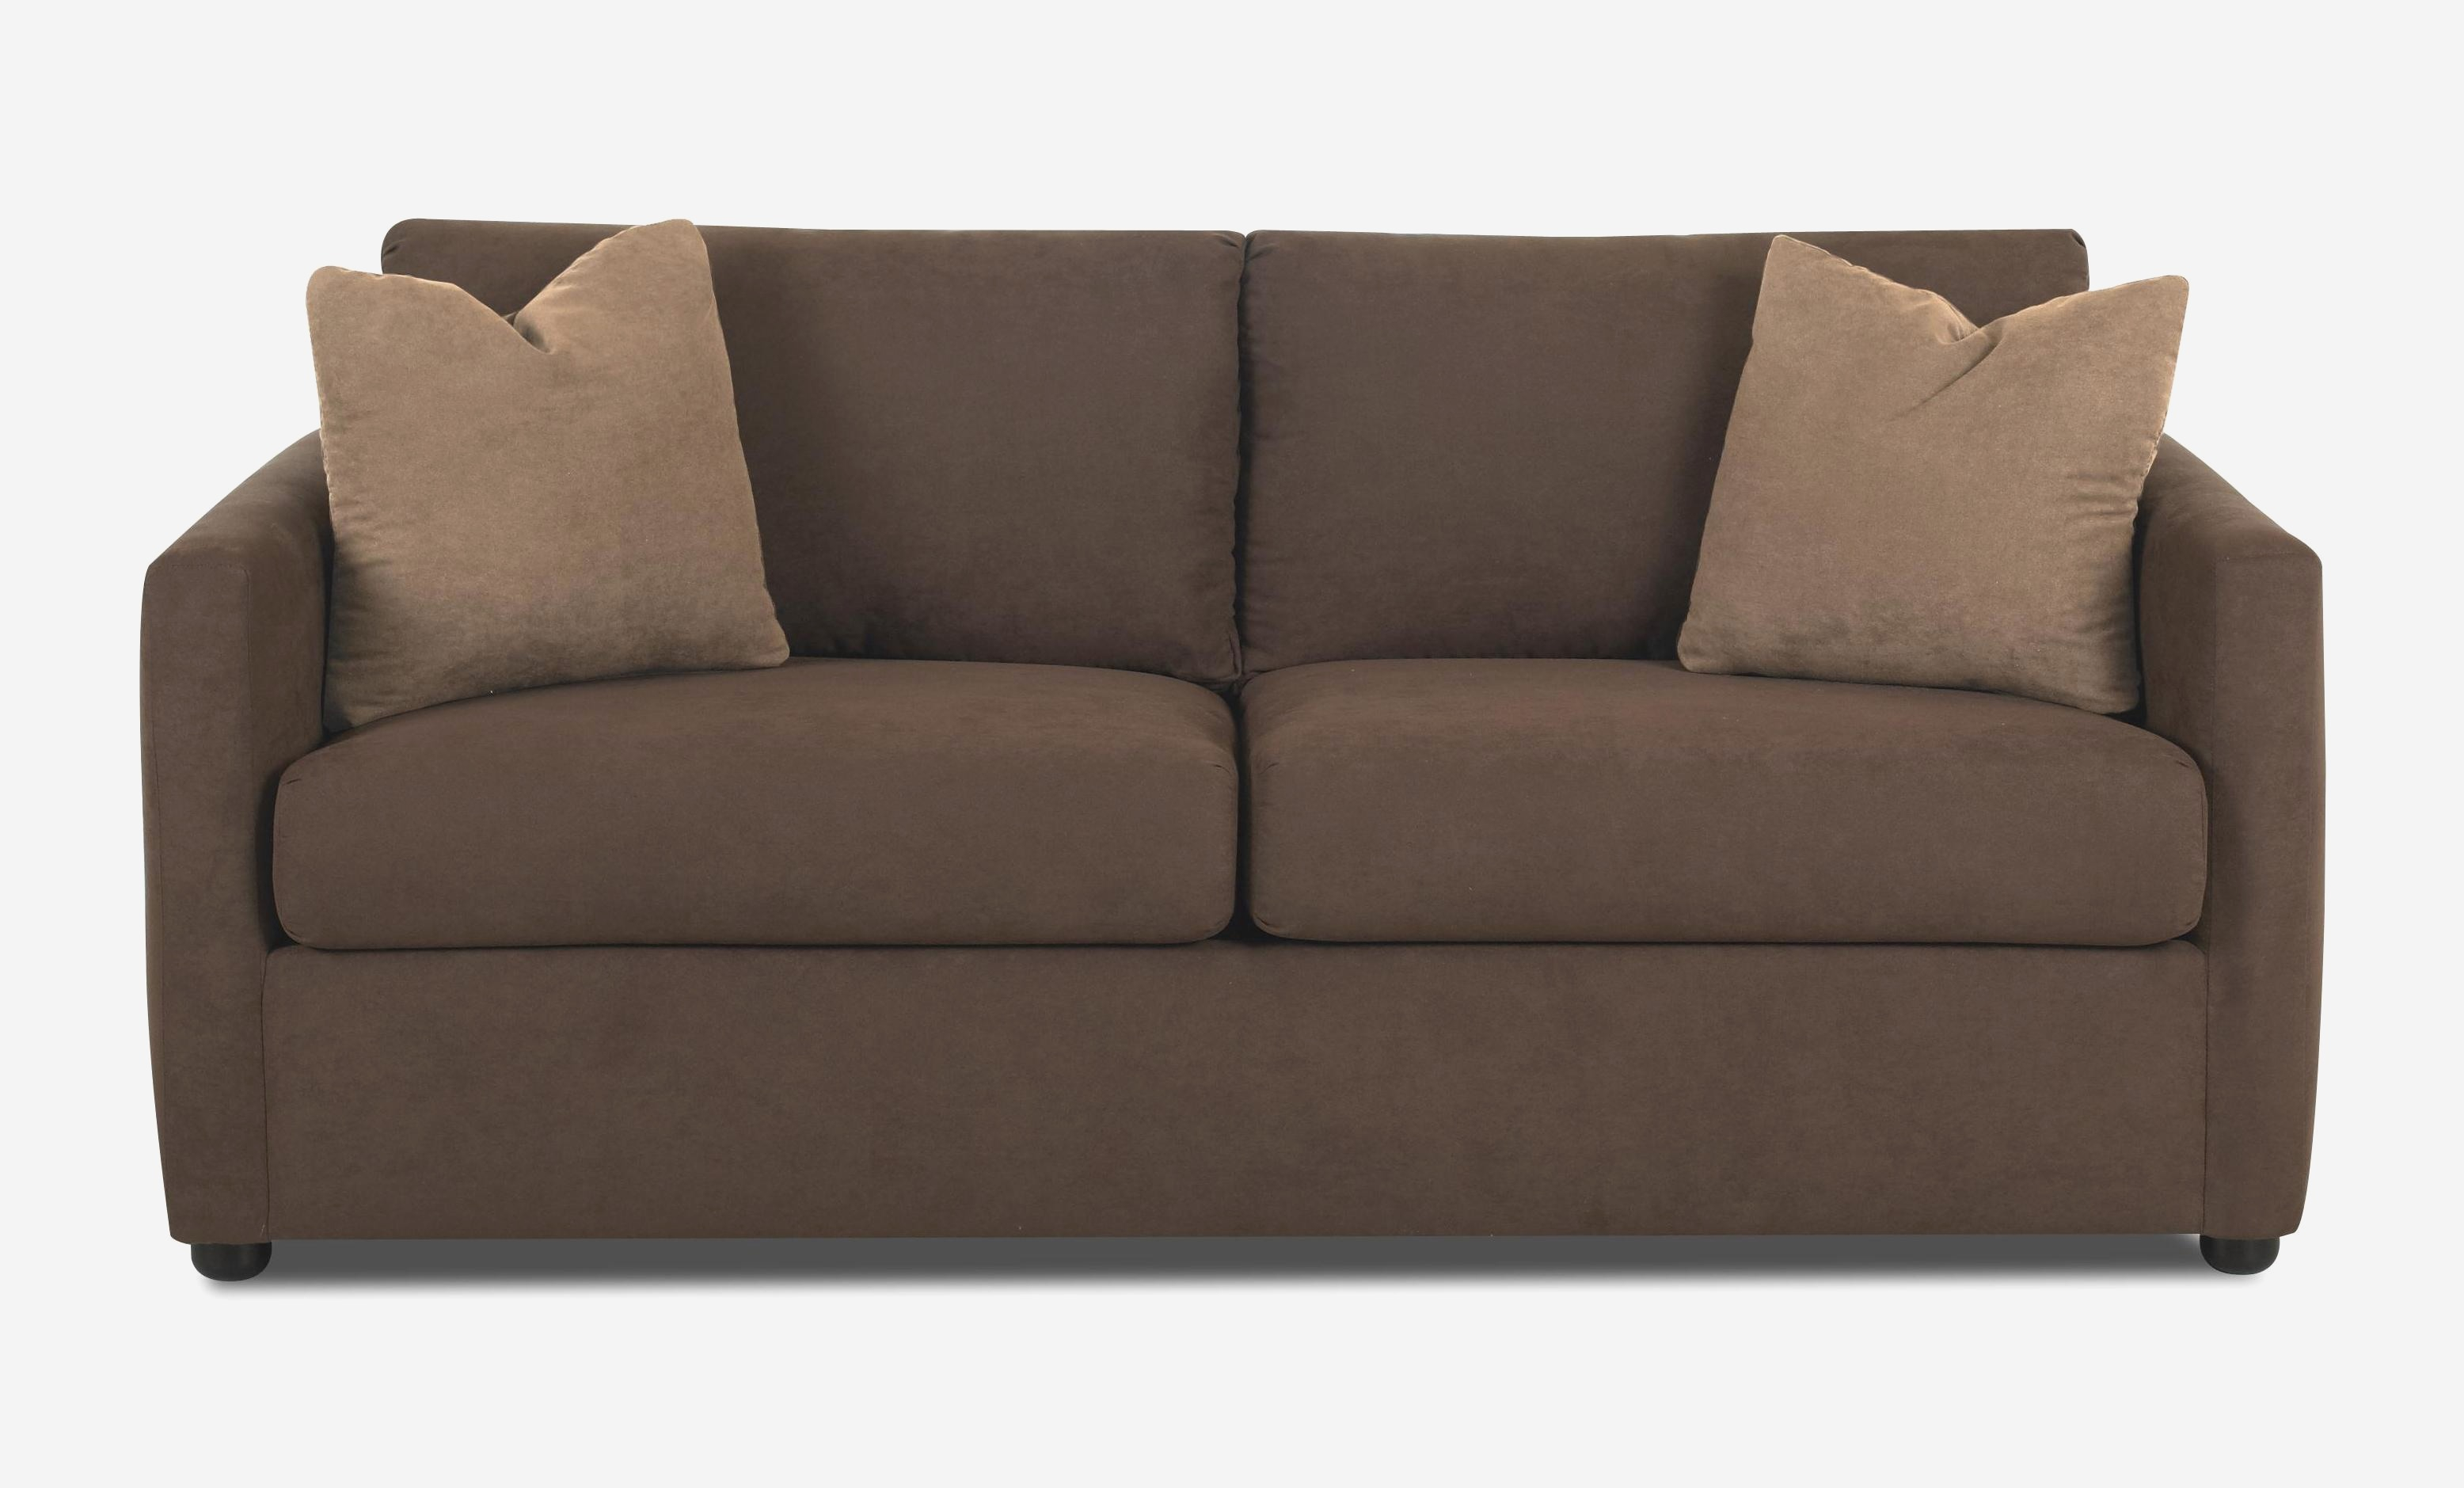 Sleeper Sofa Or Loveseat Patio Ideas